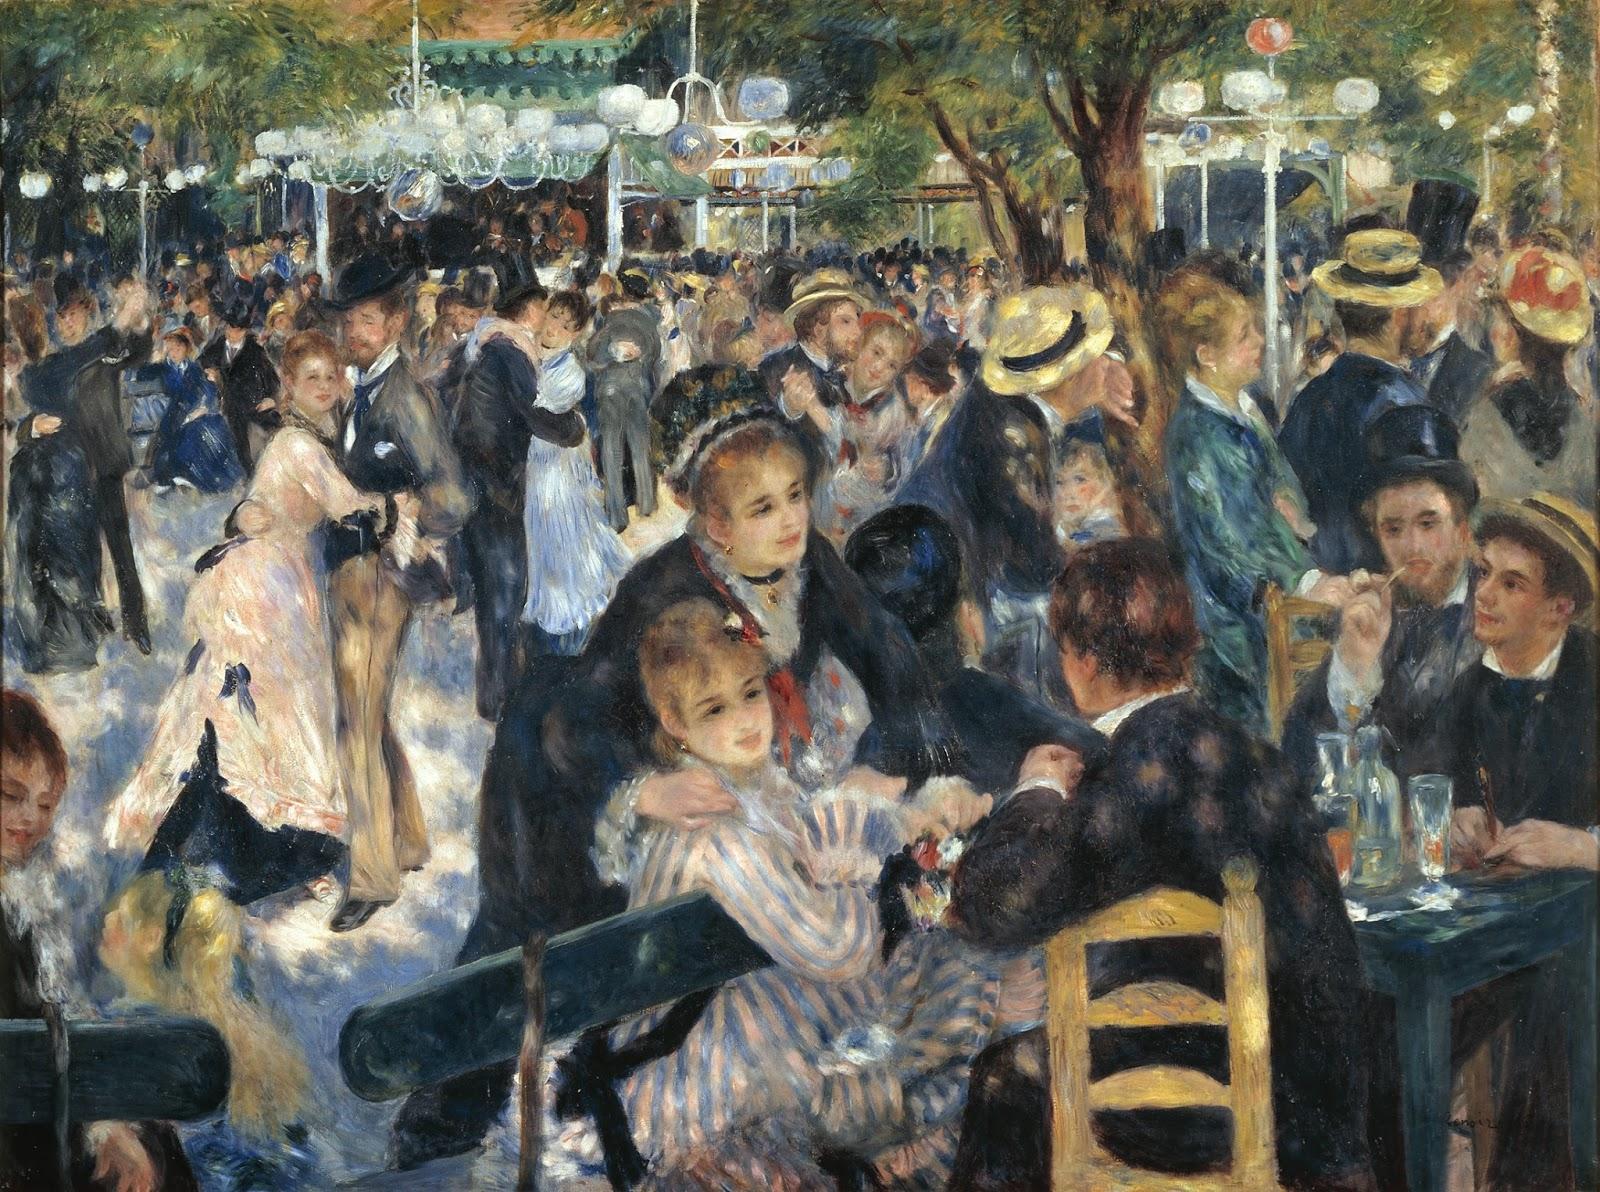 Frey Julia,Toulouse-Lautrec, Renoir, Okres ochronny na czarownice, Carmaniola